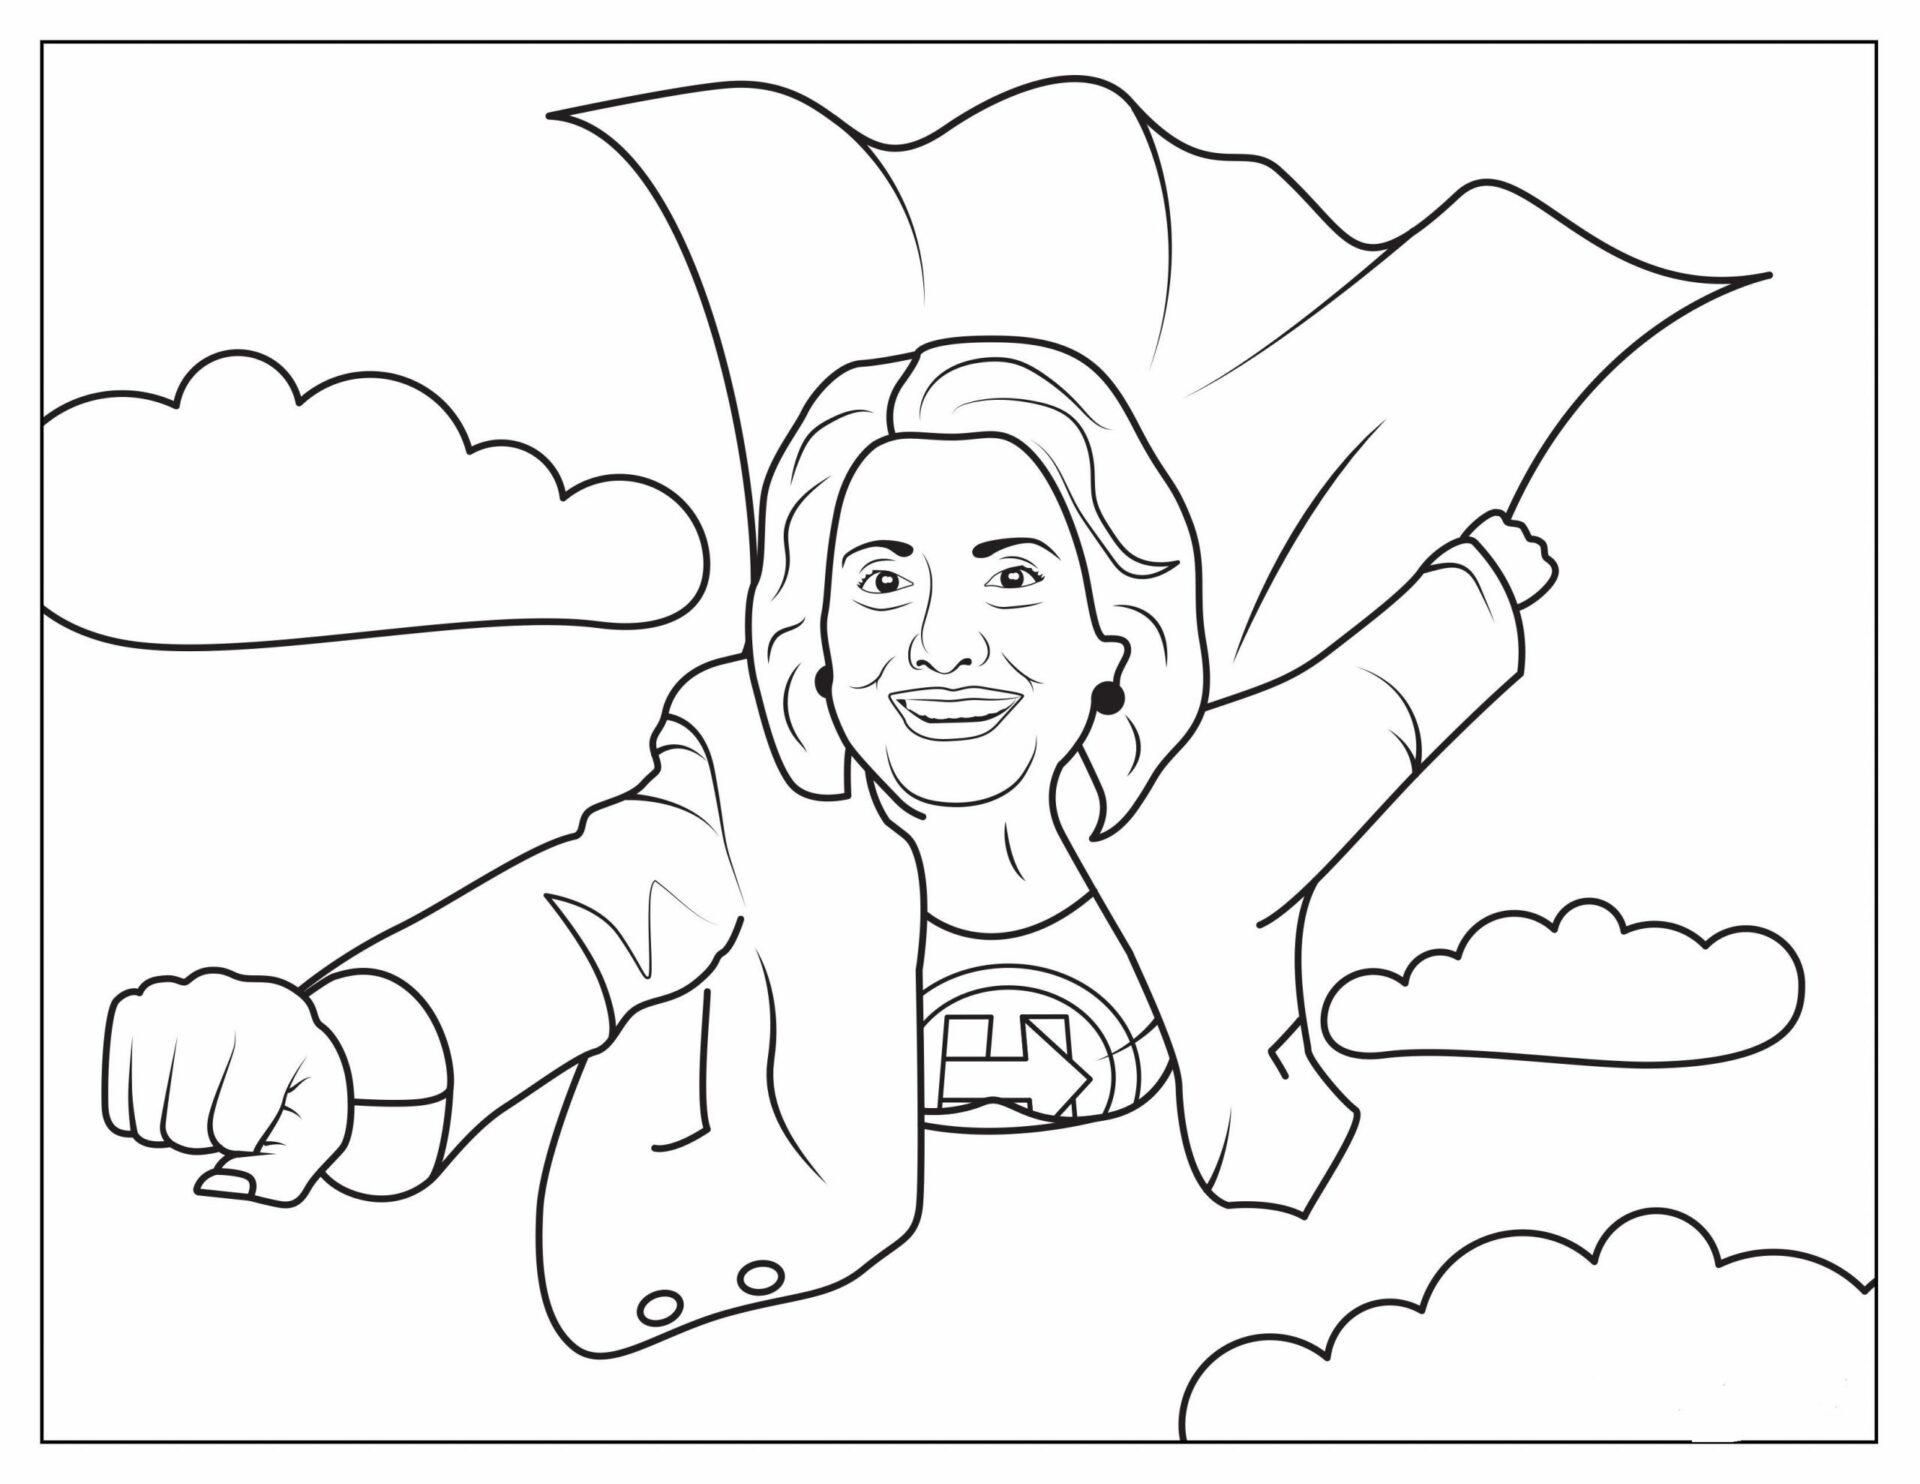 Hillary Clinton Flying